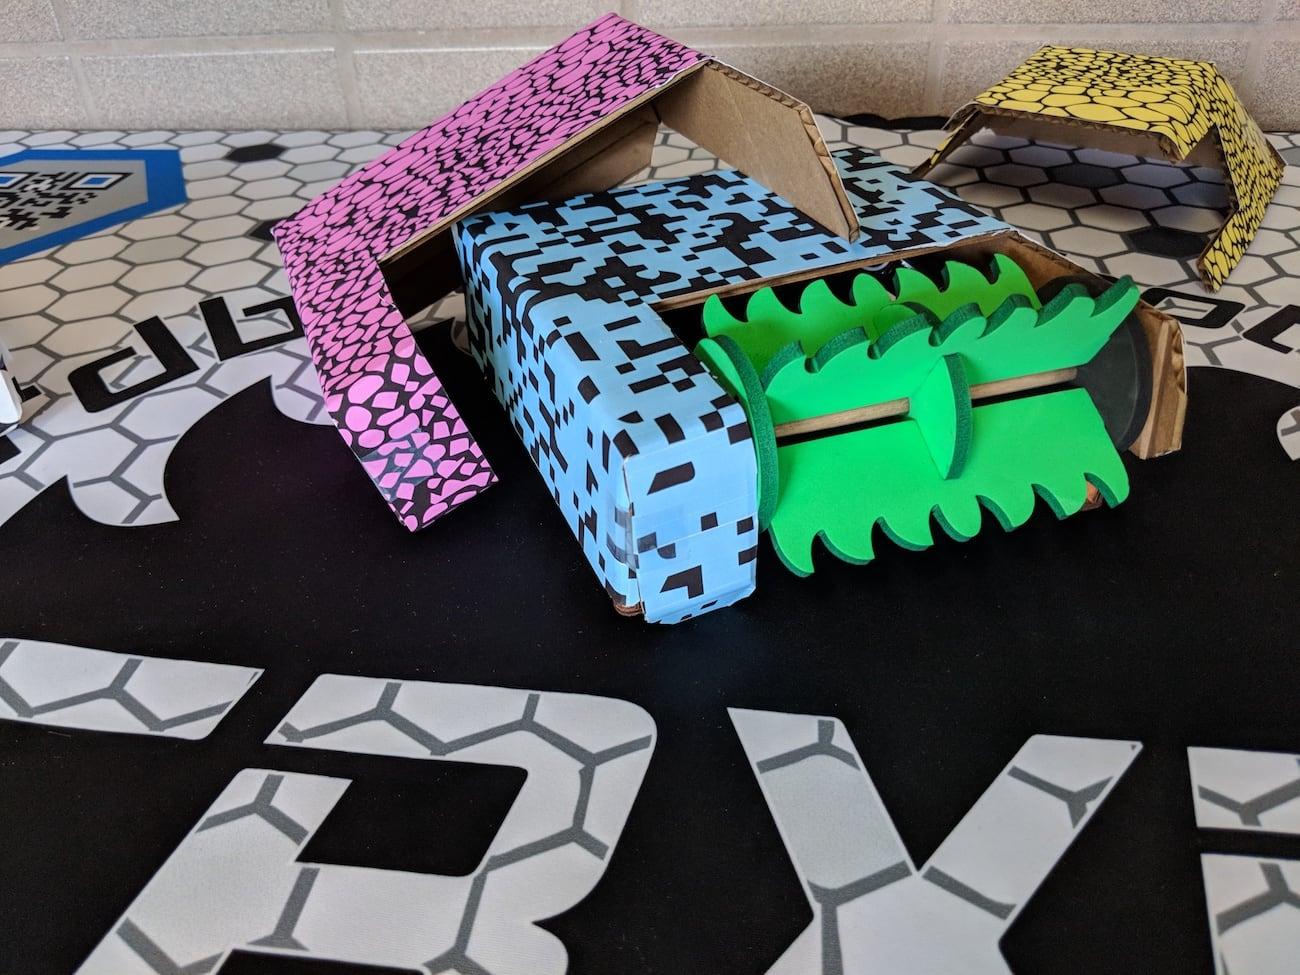 Cardboard Mixed Reality Robot Arena